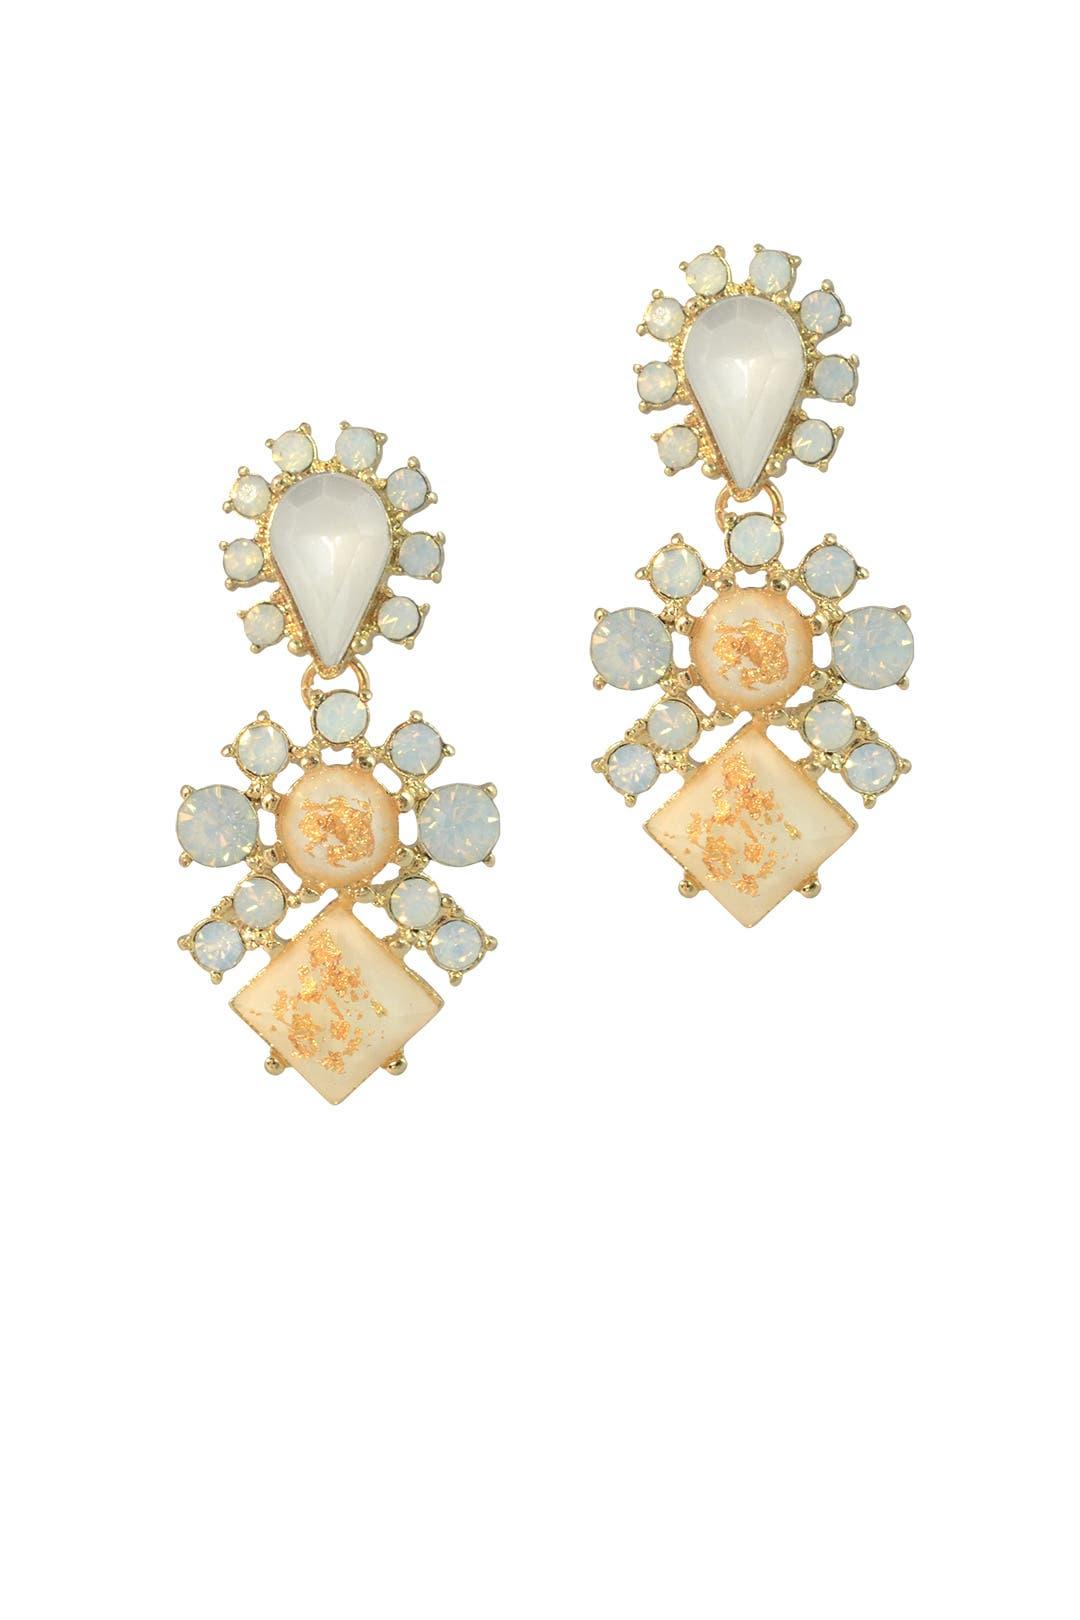 Tigers Eye Drop Earrings by Slate & Willow Accessories